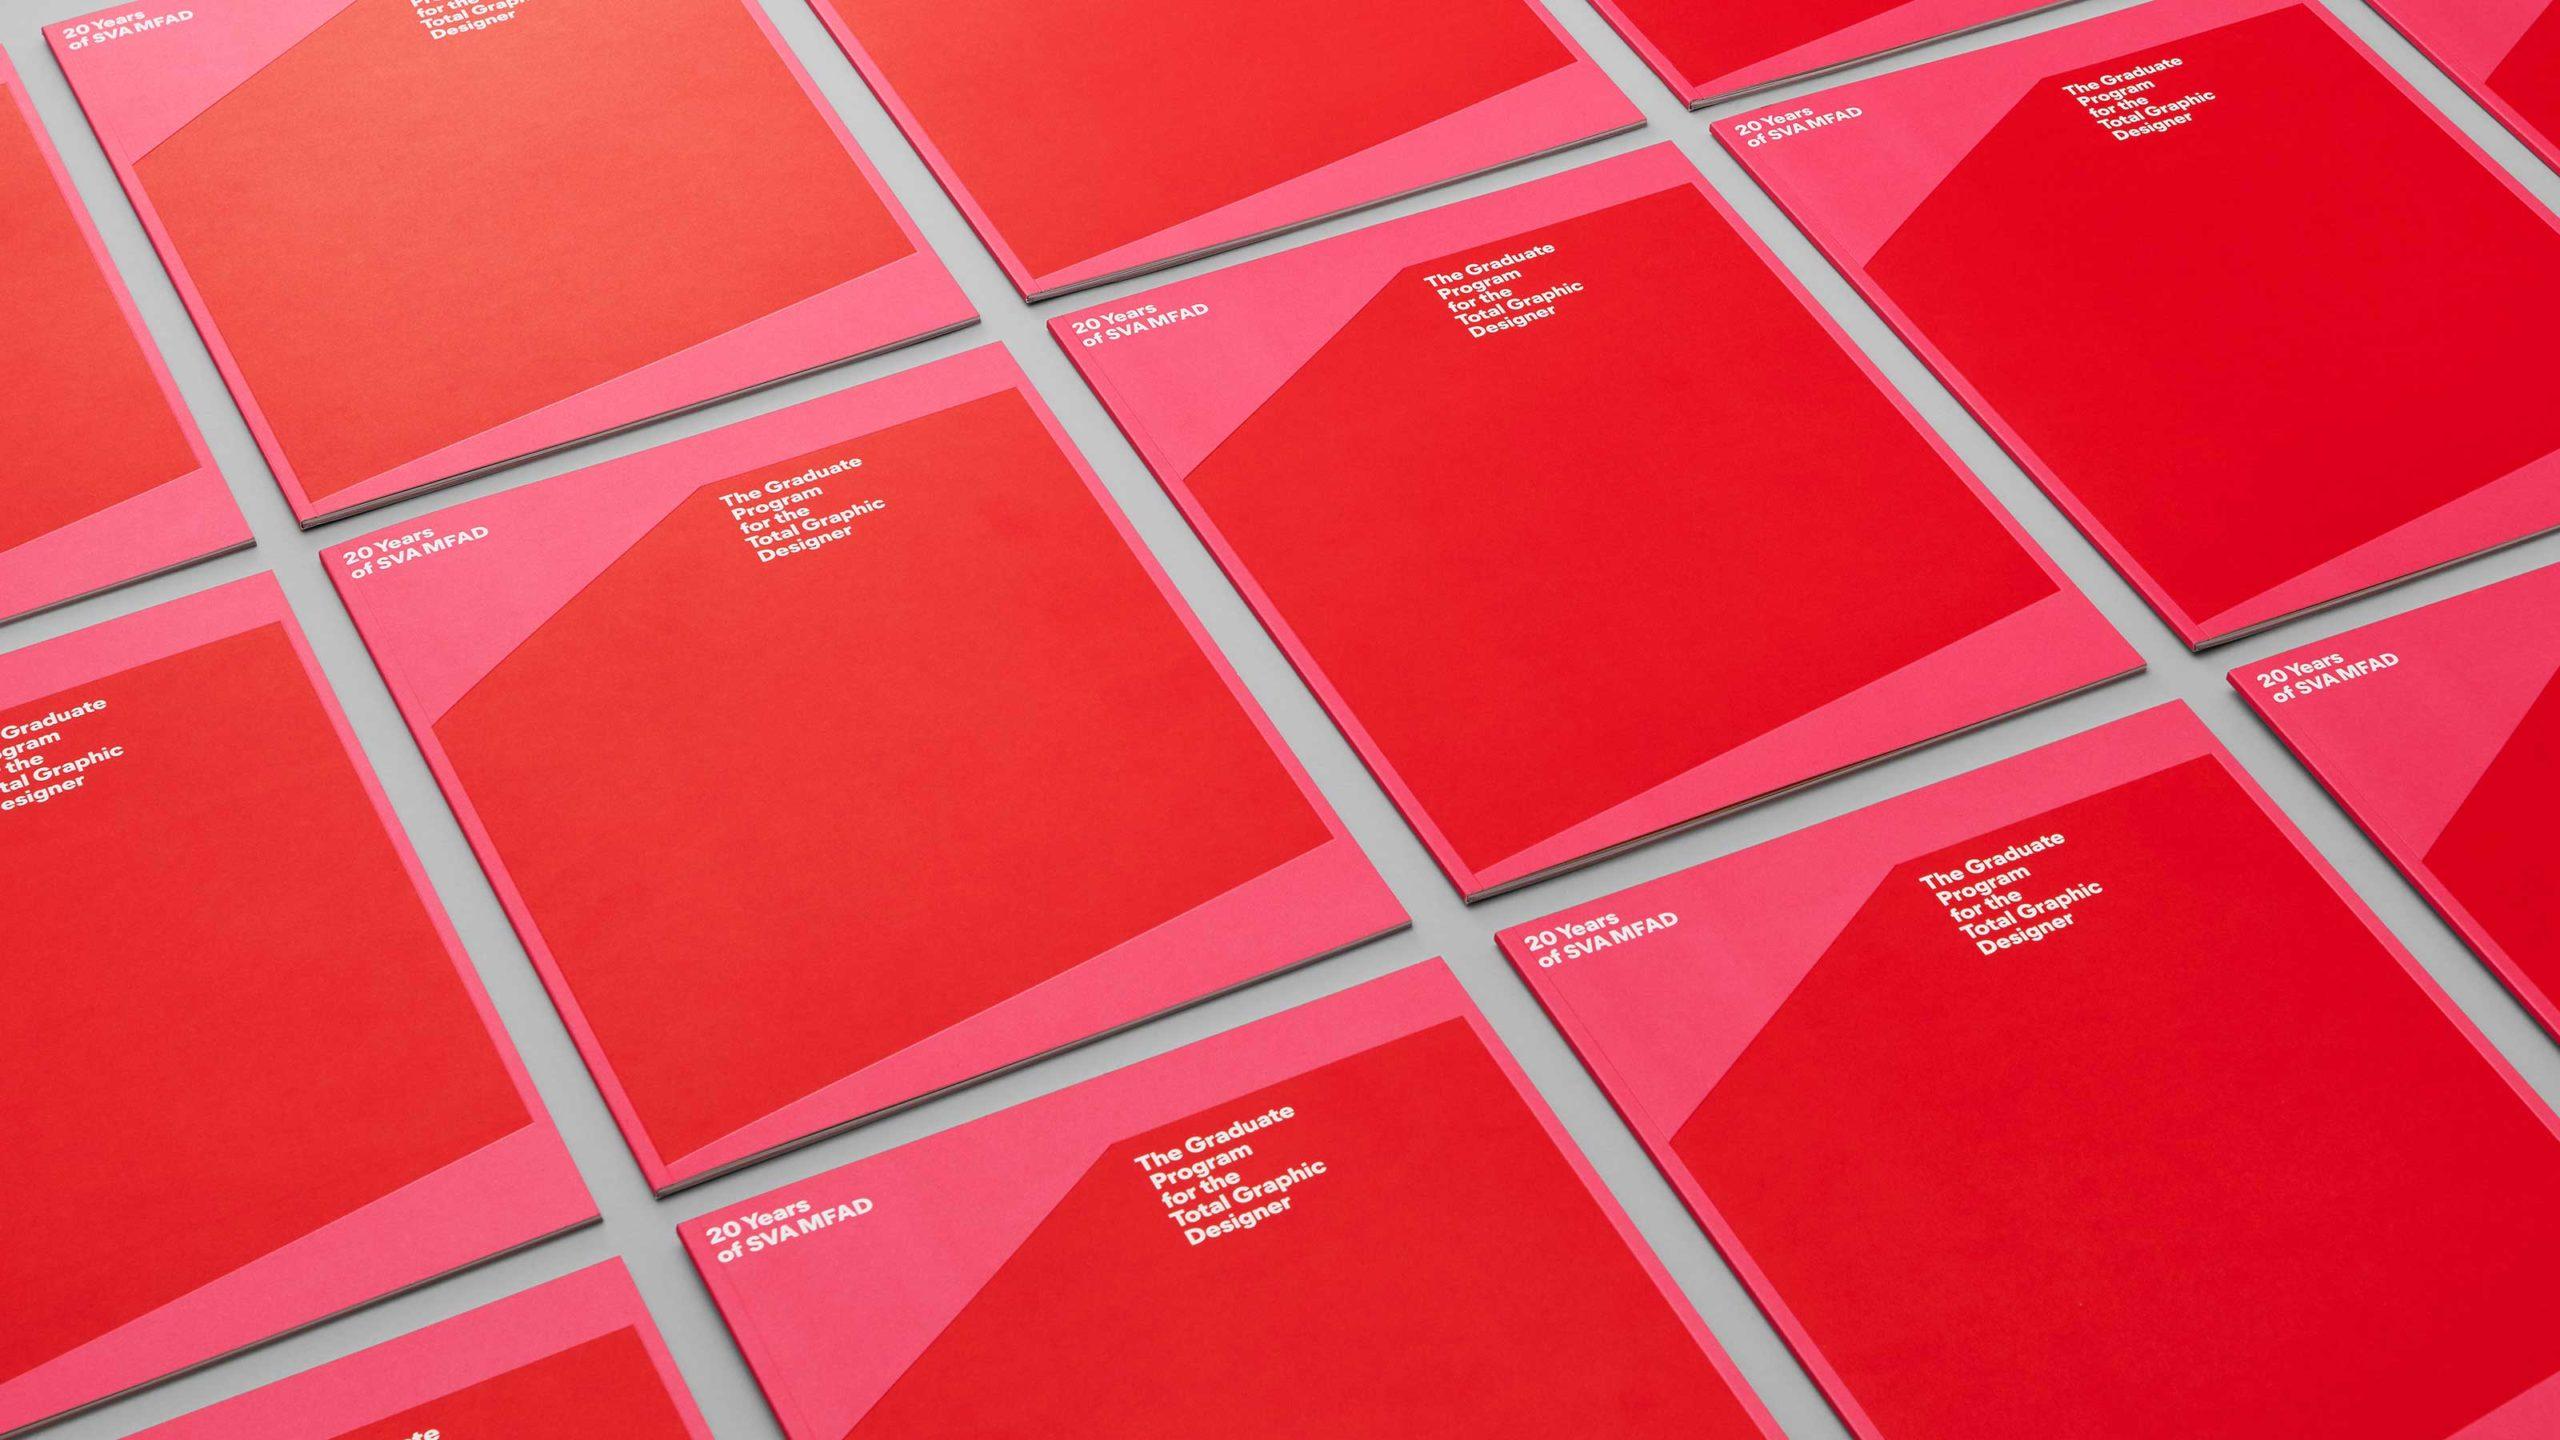 MFA Design inspiration guide